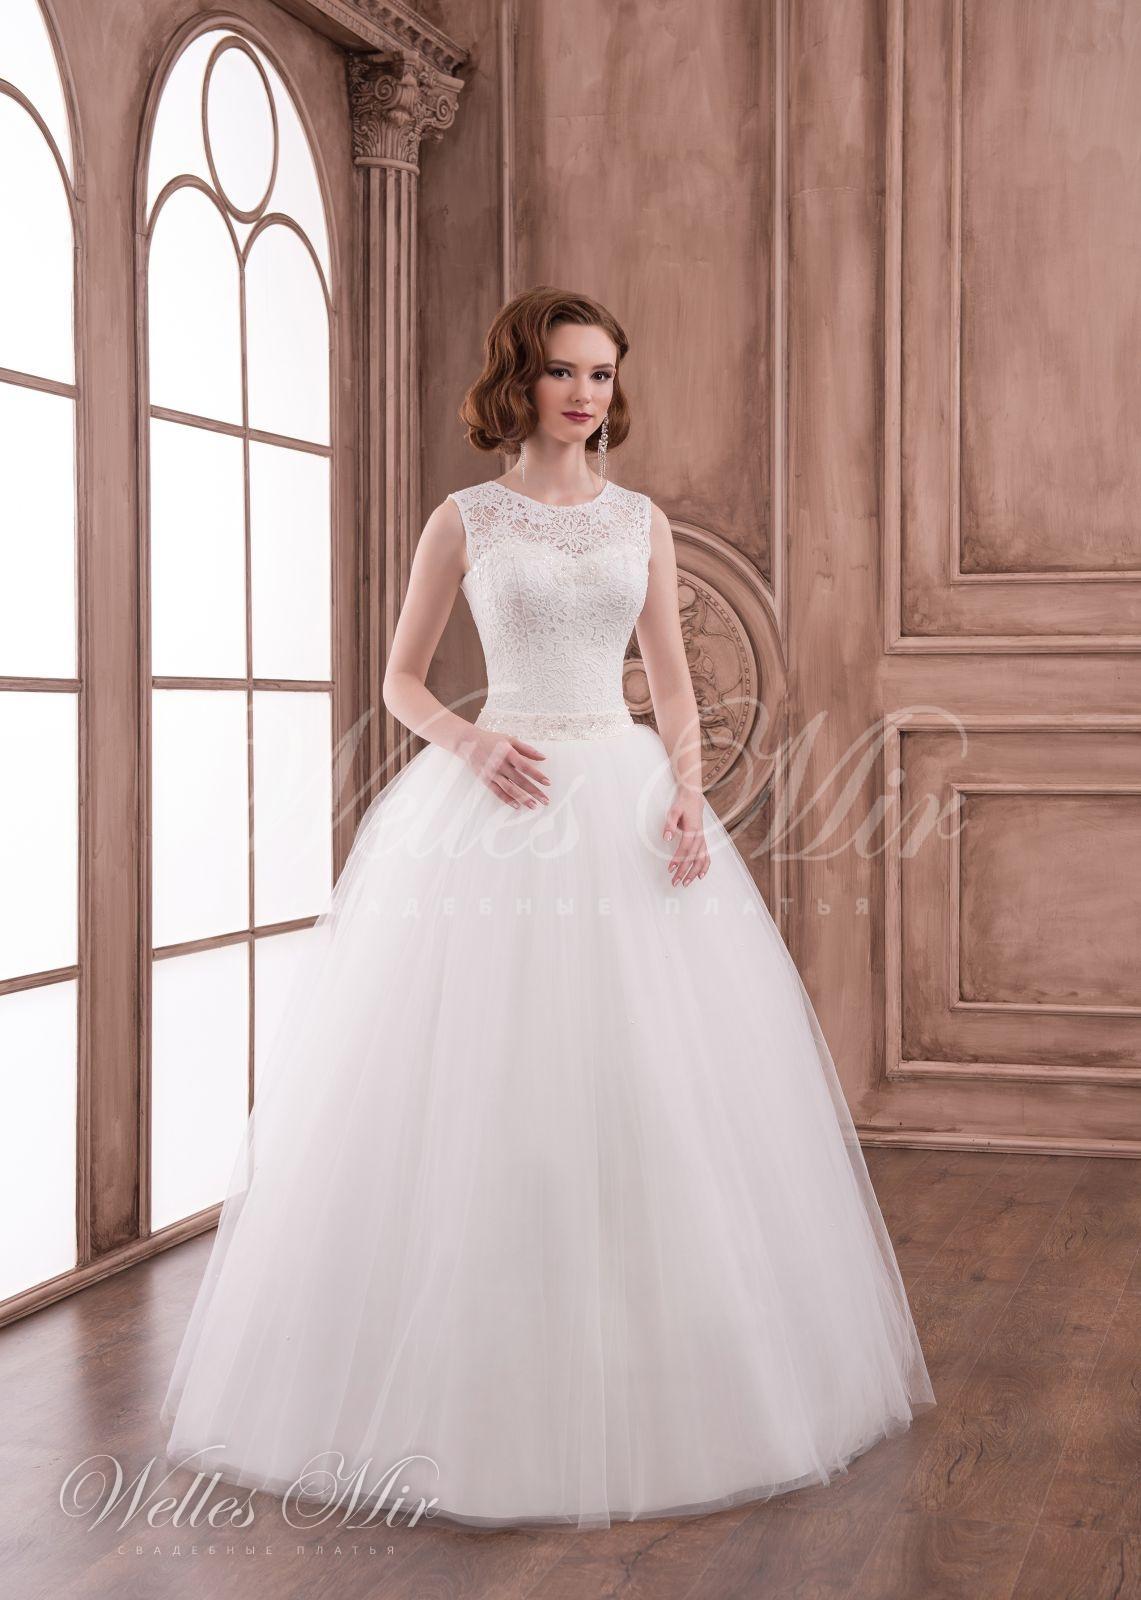 Wholesale wedding dresses   collection Gorgeous